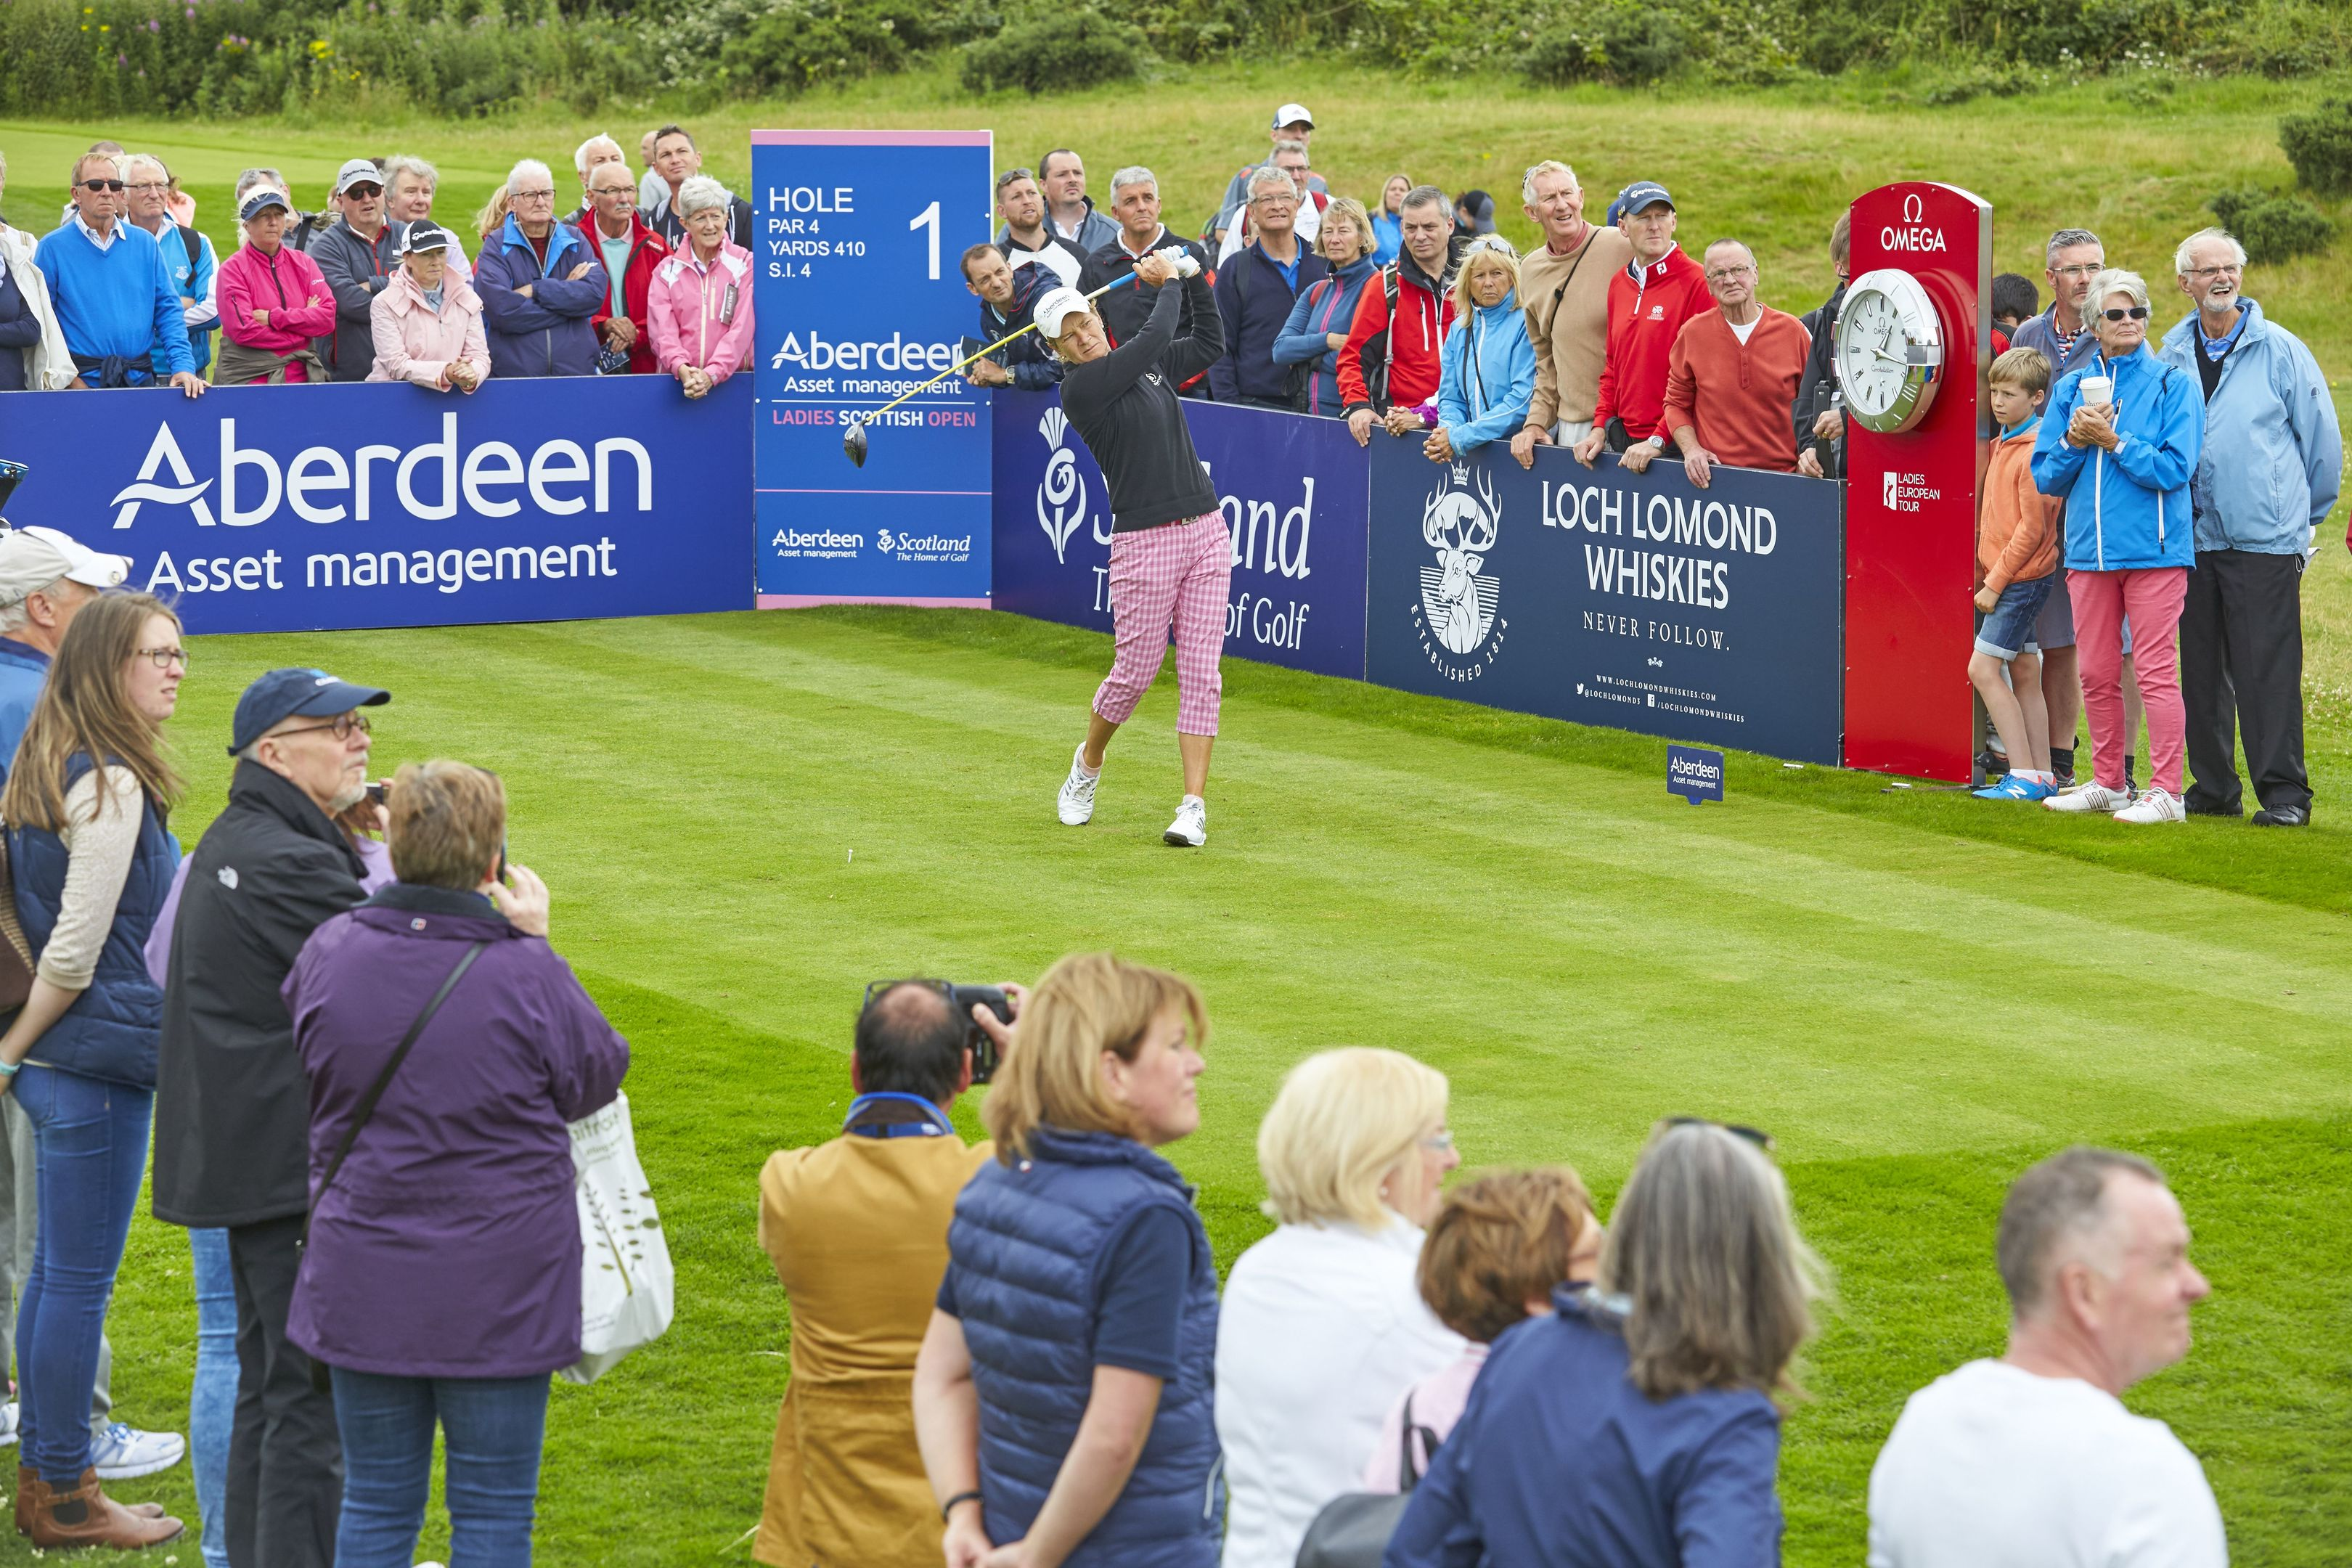 Catriona Matthew teeing off at the 2016 Aberdeen Asset Management Scottish Ladies Open at  Dundonald.